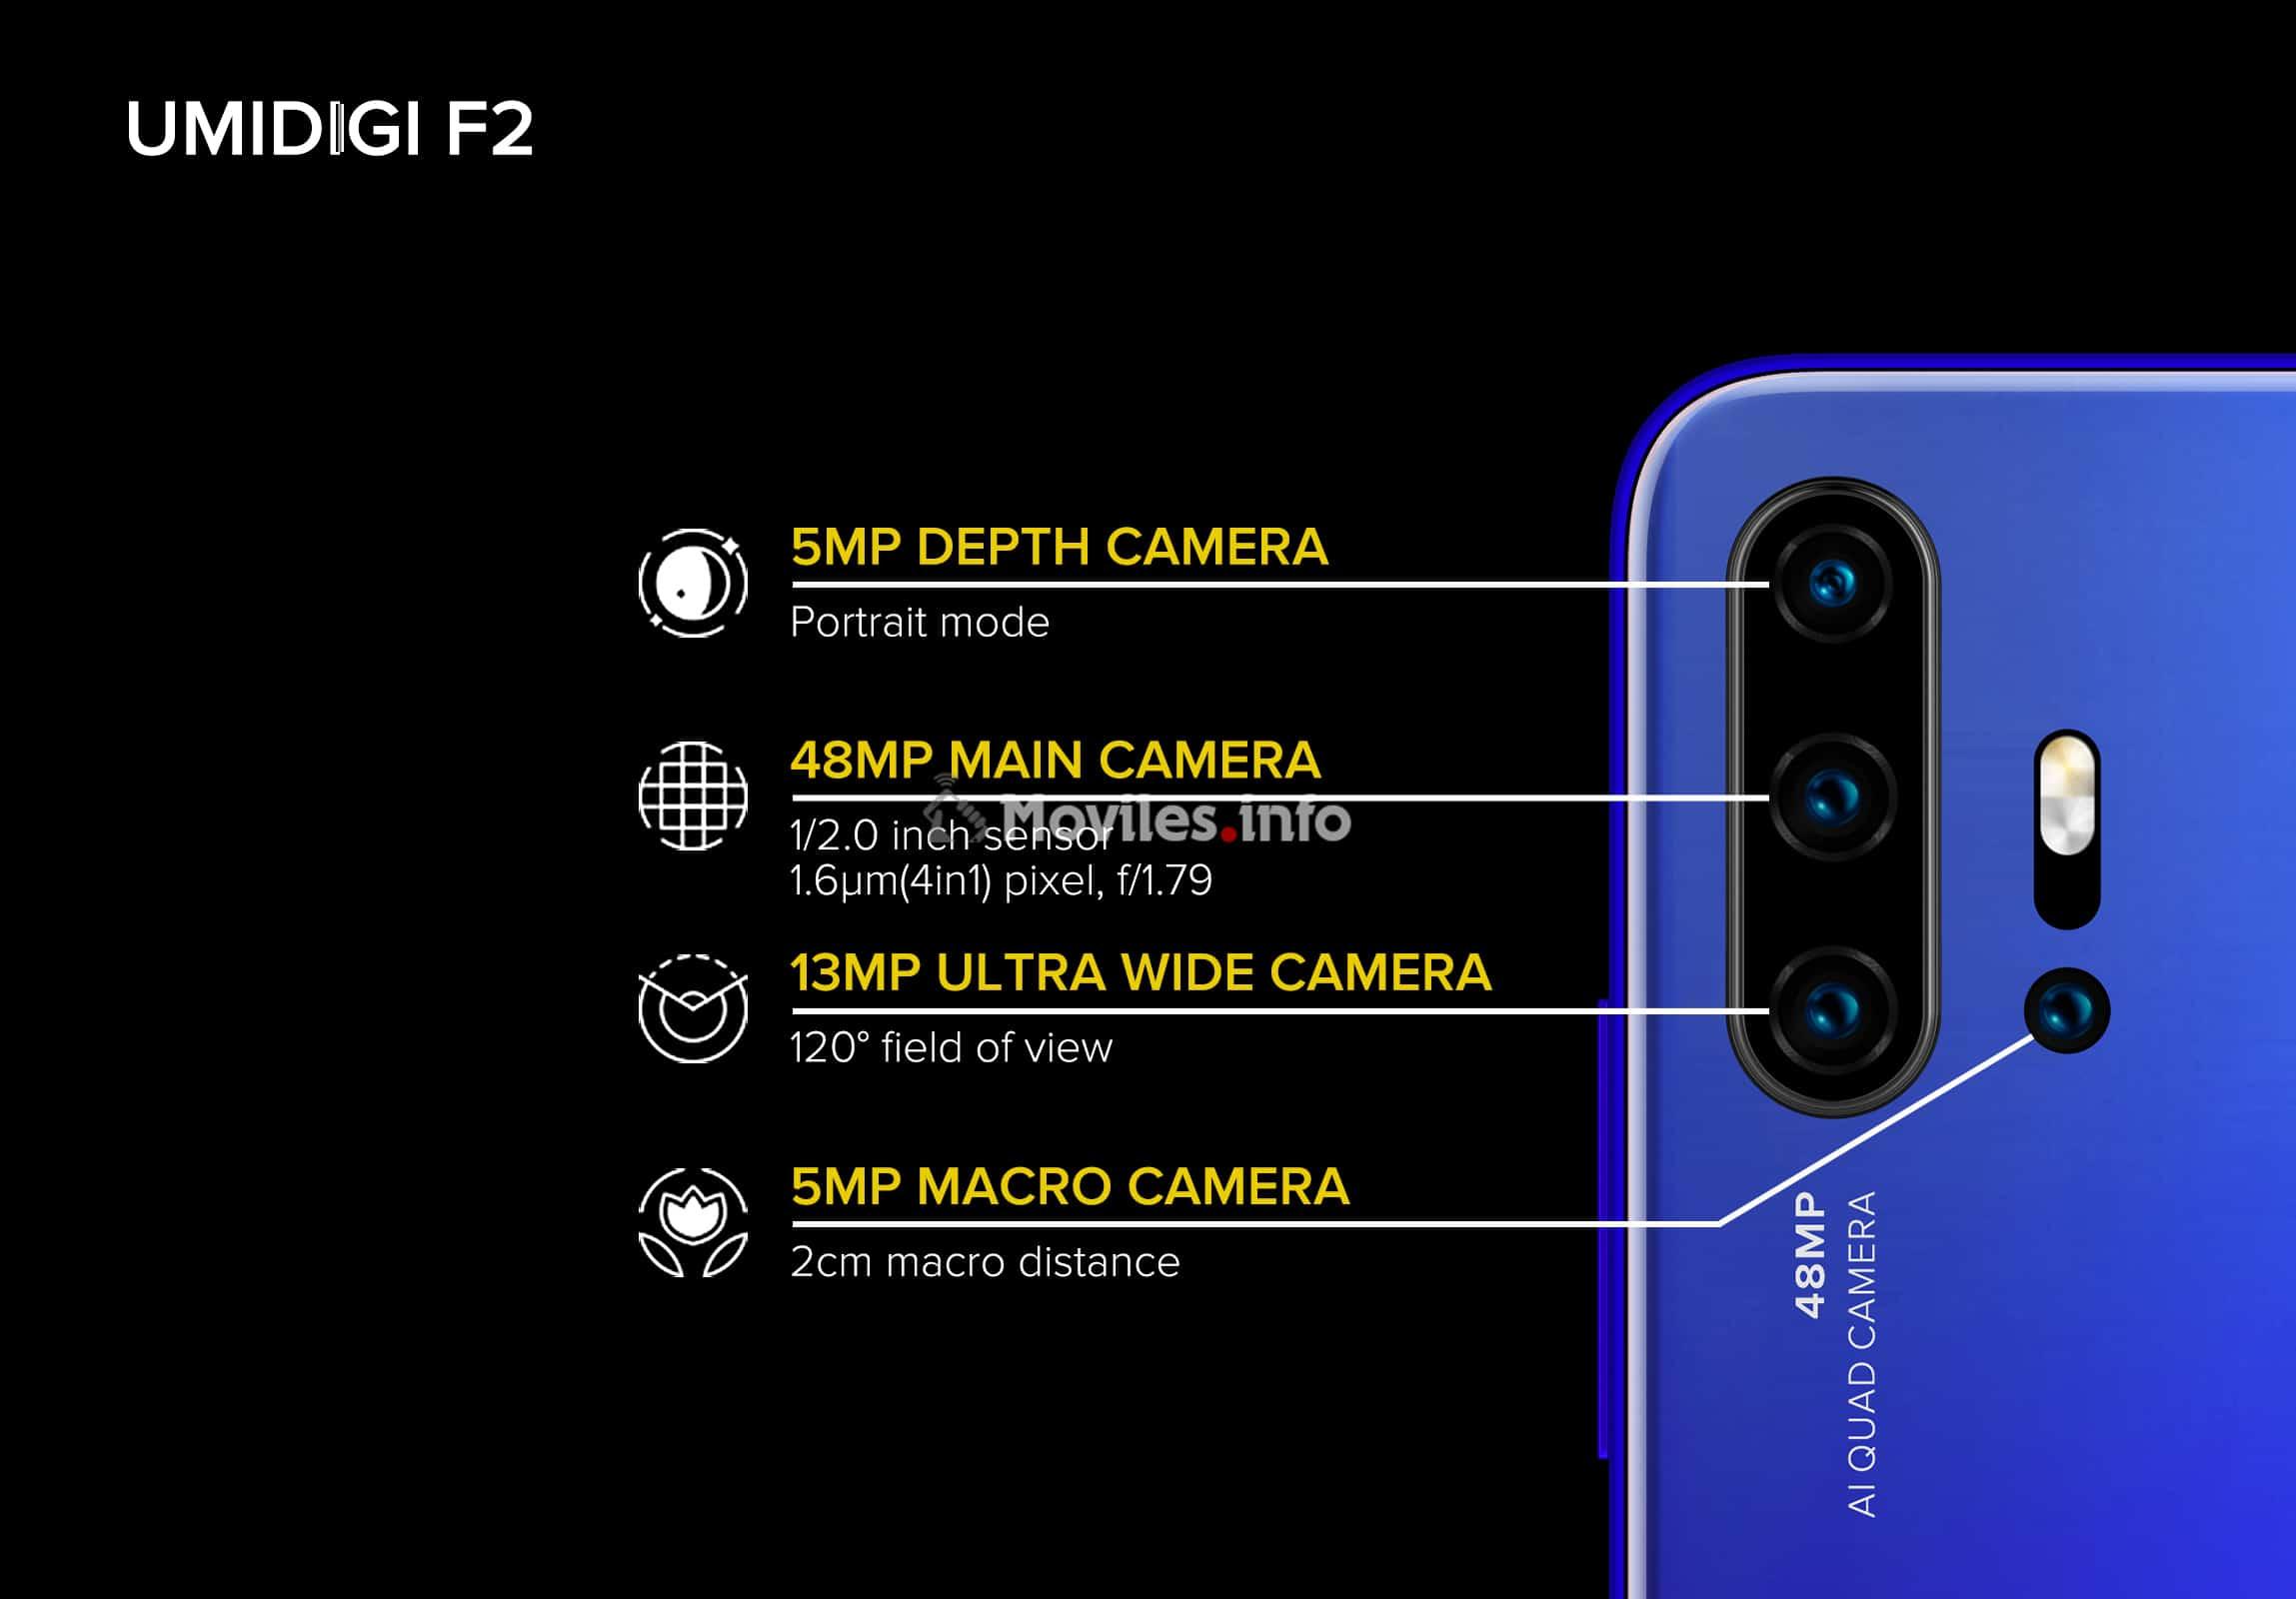 la cámara cuádruple del UMIDIGI F2